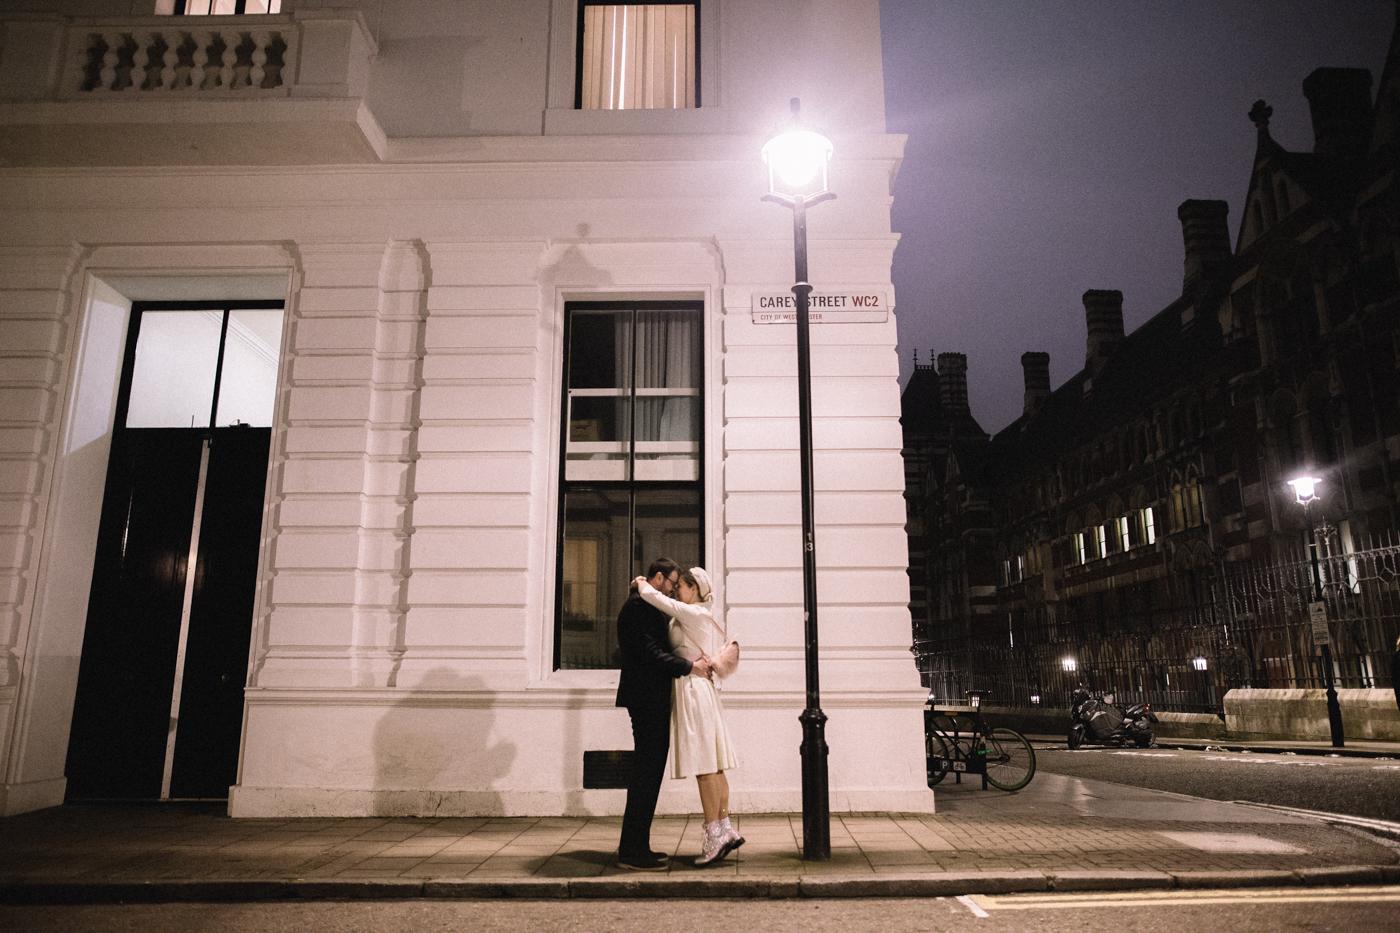 knights-templar-london-city-centre-wedding-photographer-charing-cross-creative-0035.jpg